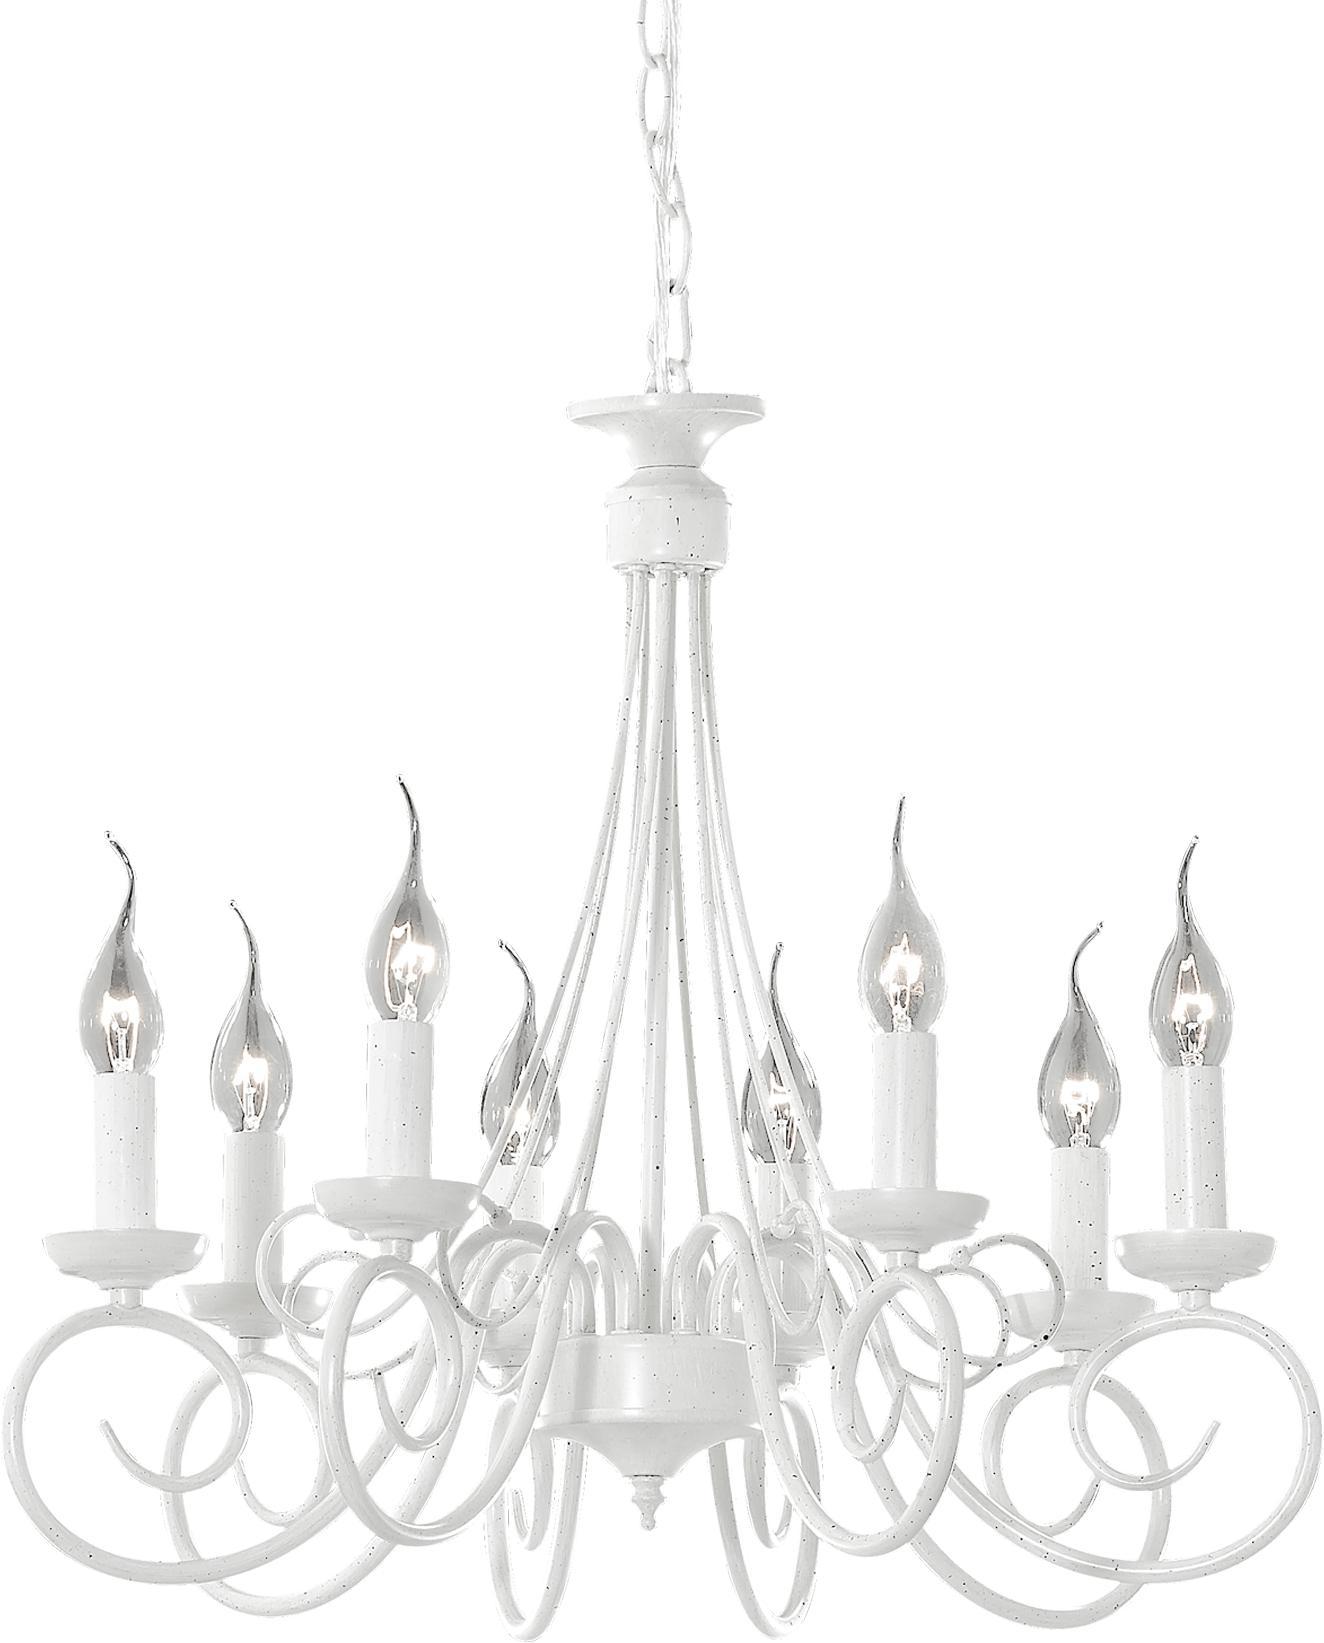 Ideal lux LED Brandy Kronleuchter 8x5W 66639